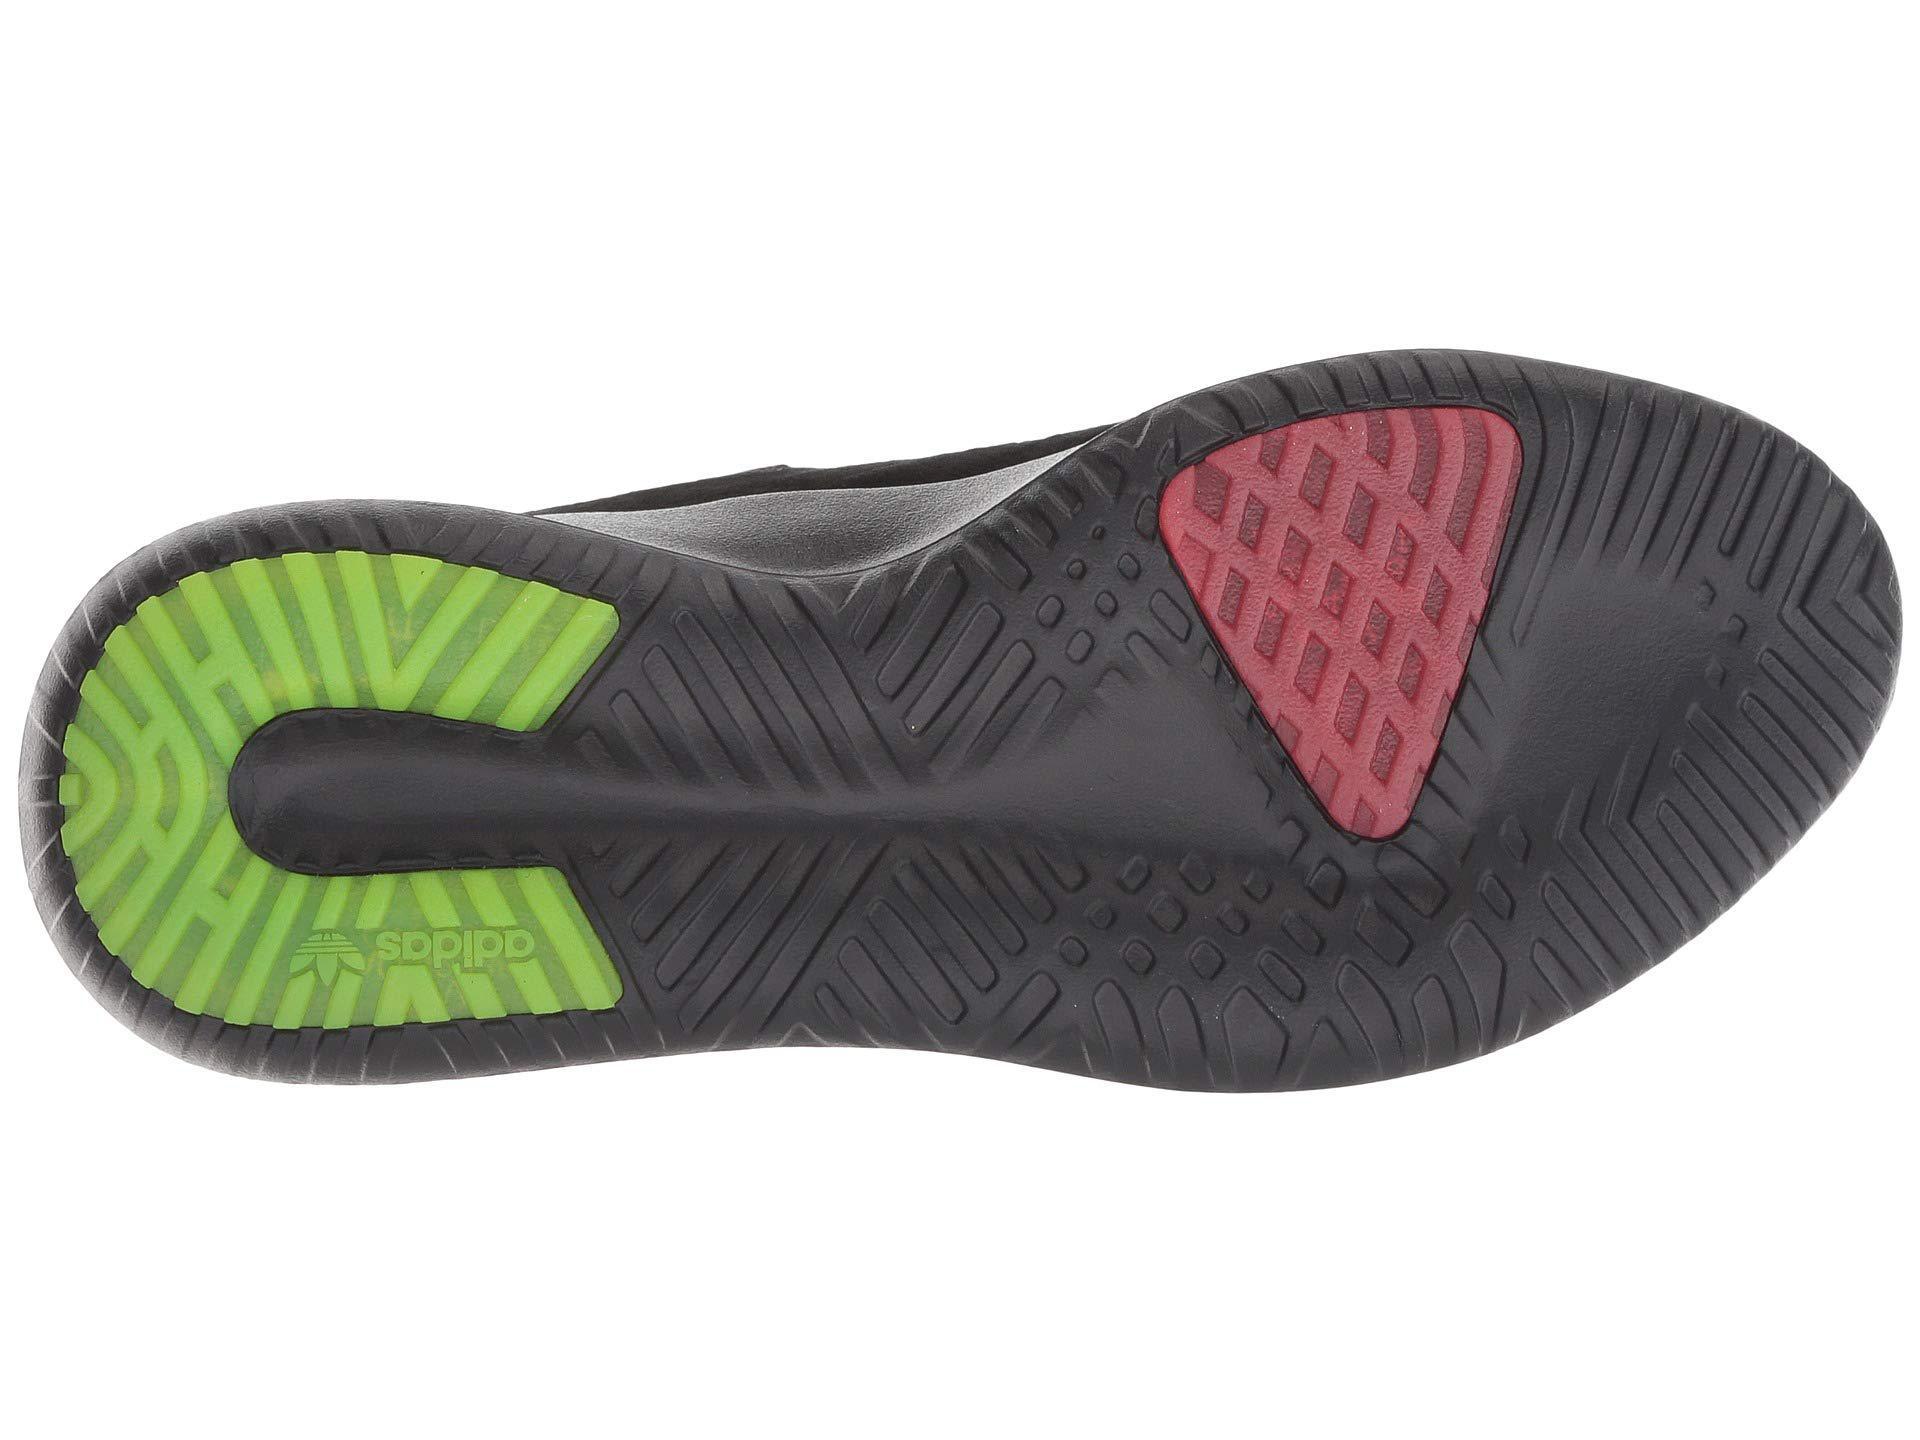 2a7e776581bc28 adidas-originals-BlackSemi-Solar-YellowScarlet-Tubular-Shadow-W-chalk-Whiteshock-Pinkutility-Green-Womens- Shoes.jpeg